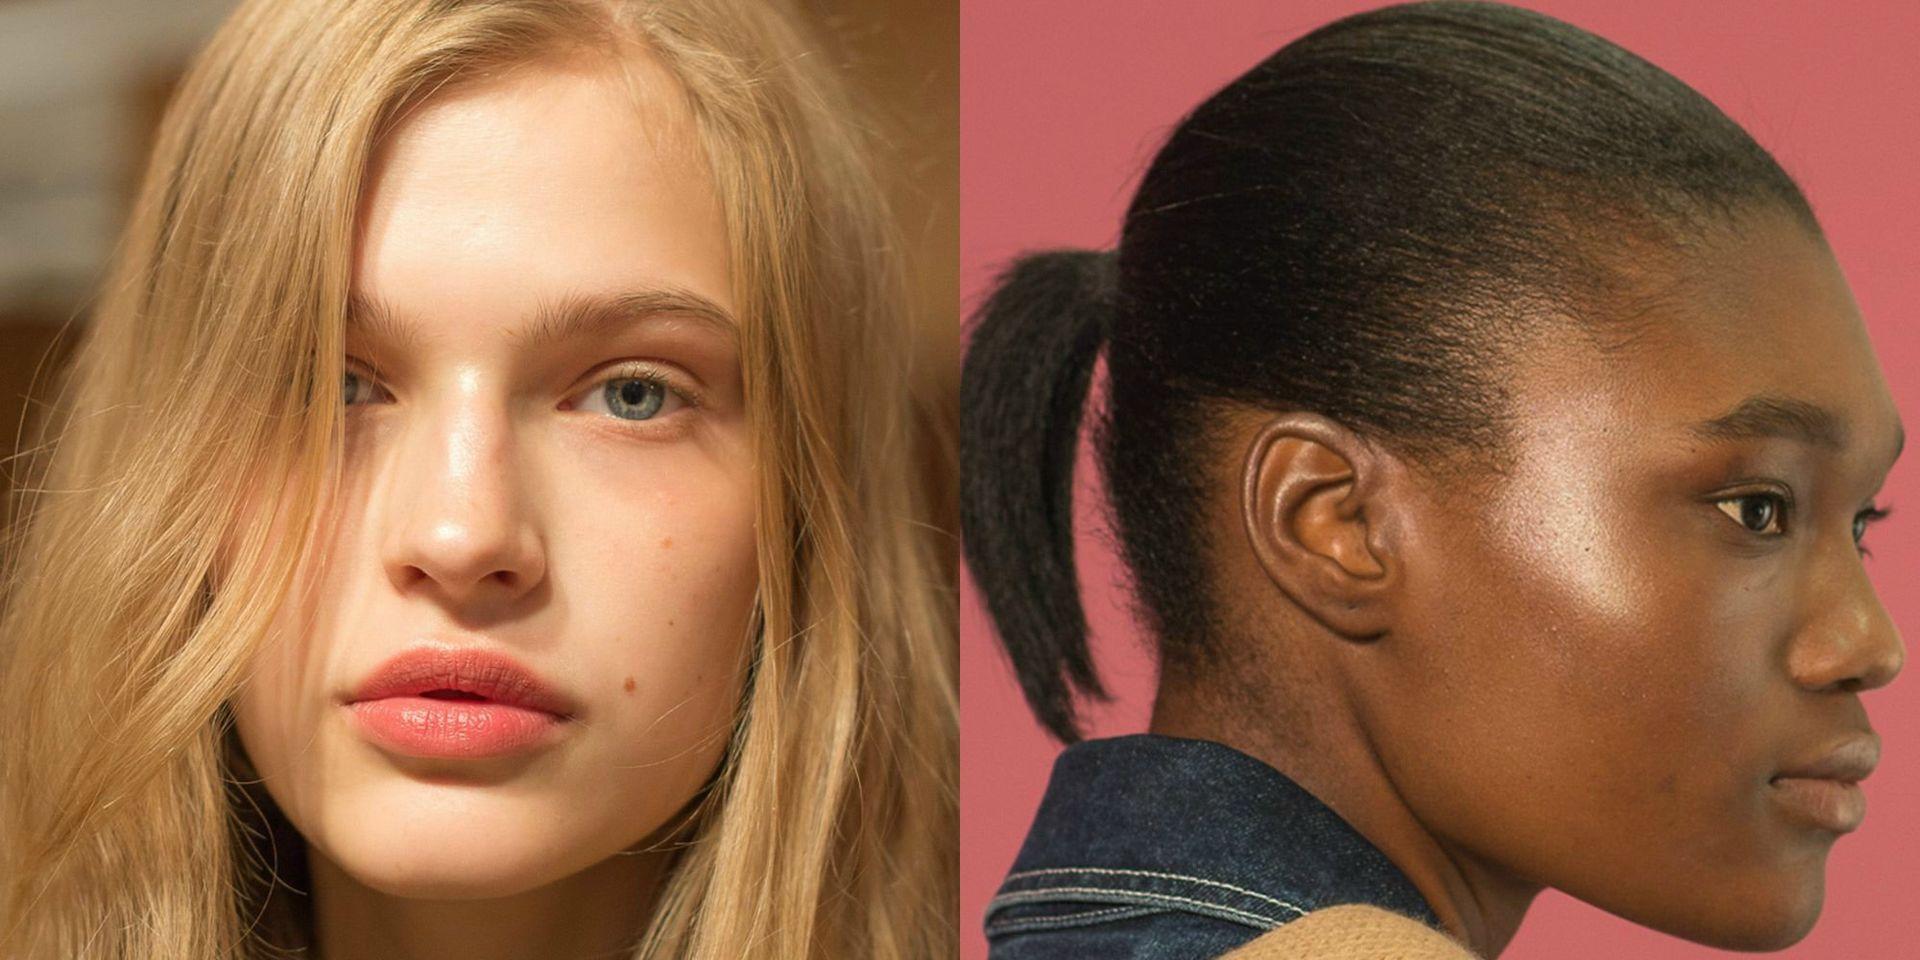 alexa-chung-spring-summer-2019-beauty-trends-glowing-skin-1537175997-beauty